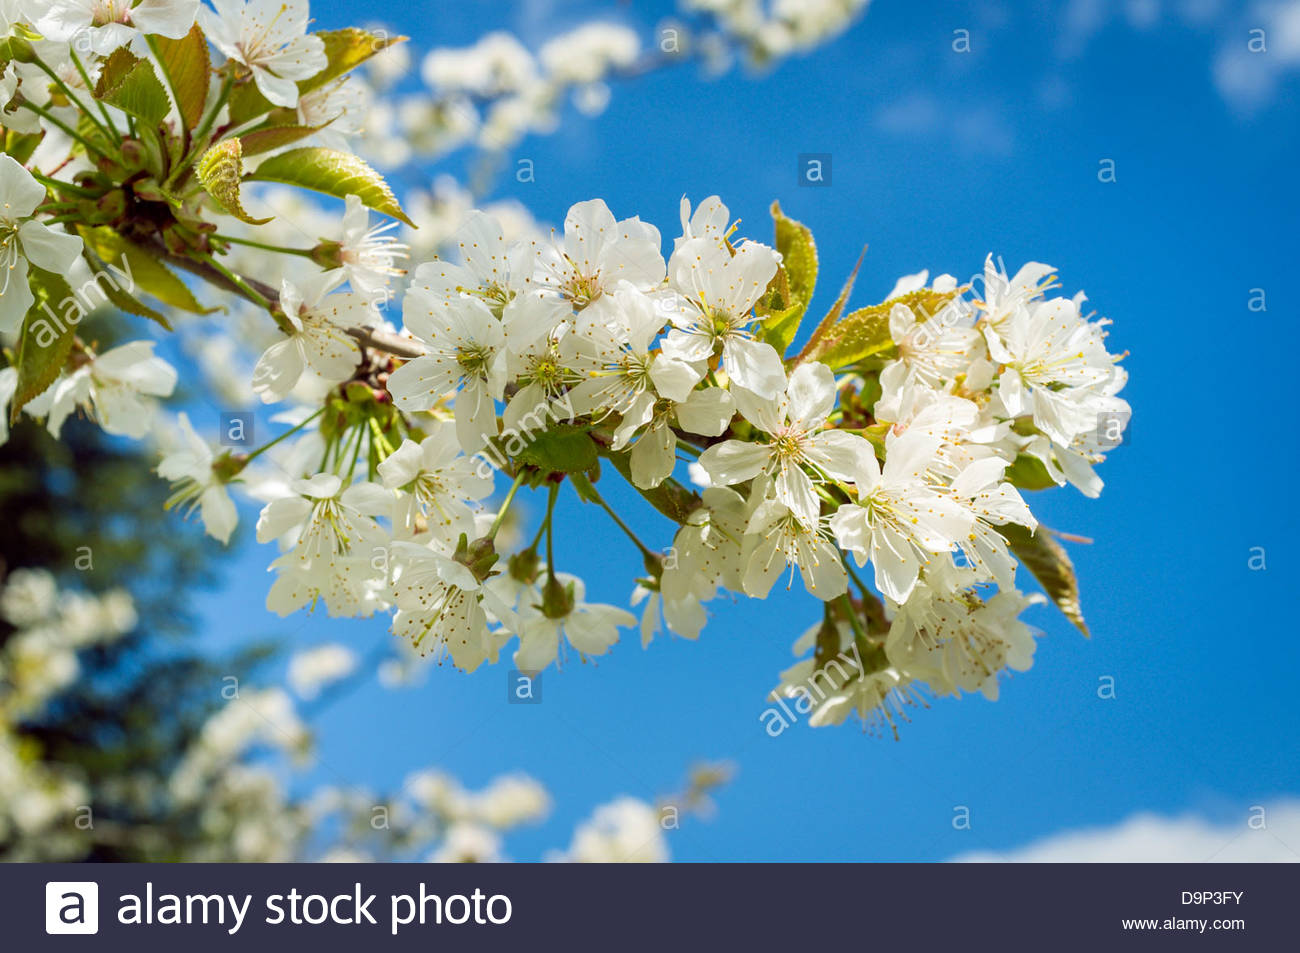 Blossoms from wild cherry tree (Prunus avium) in spring - Stock Image